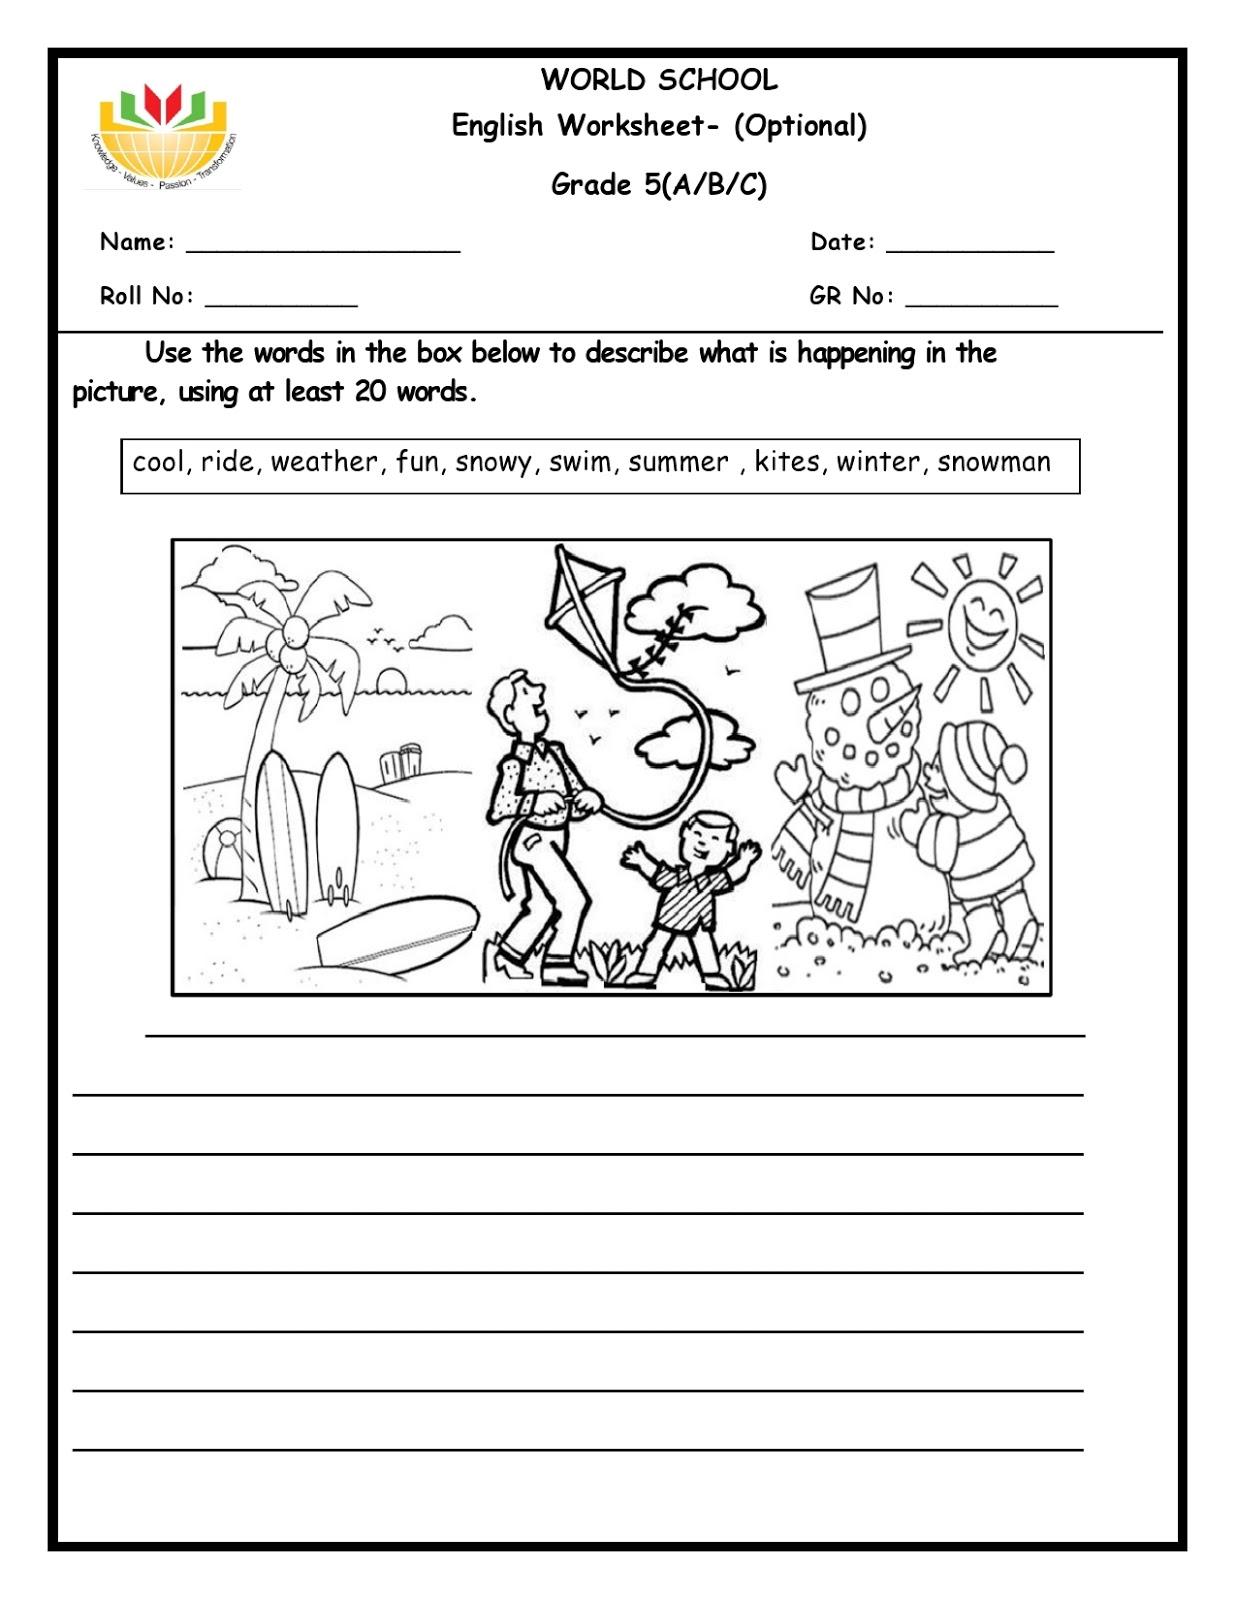 WORLD SCHOOL OMAN: Homework for Grade 5 as on 03/03/2020 [ 1600 x 1236 Pixel ]